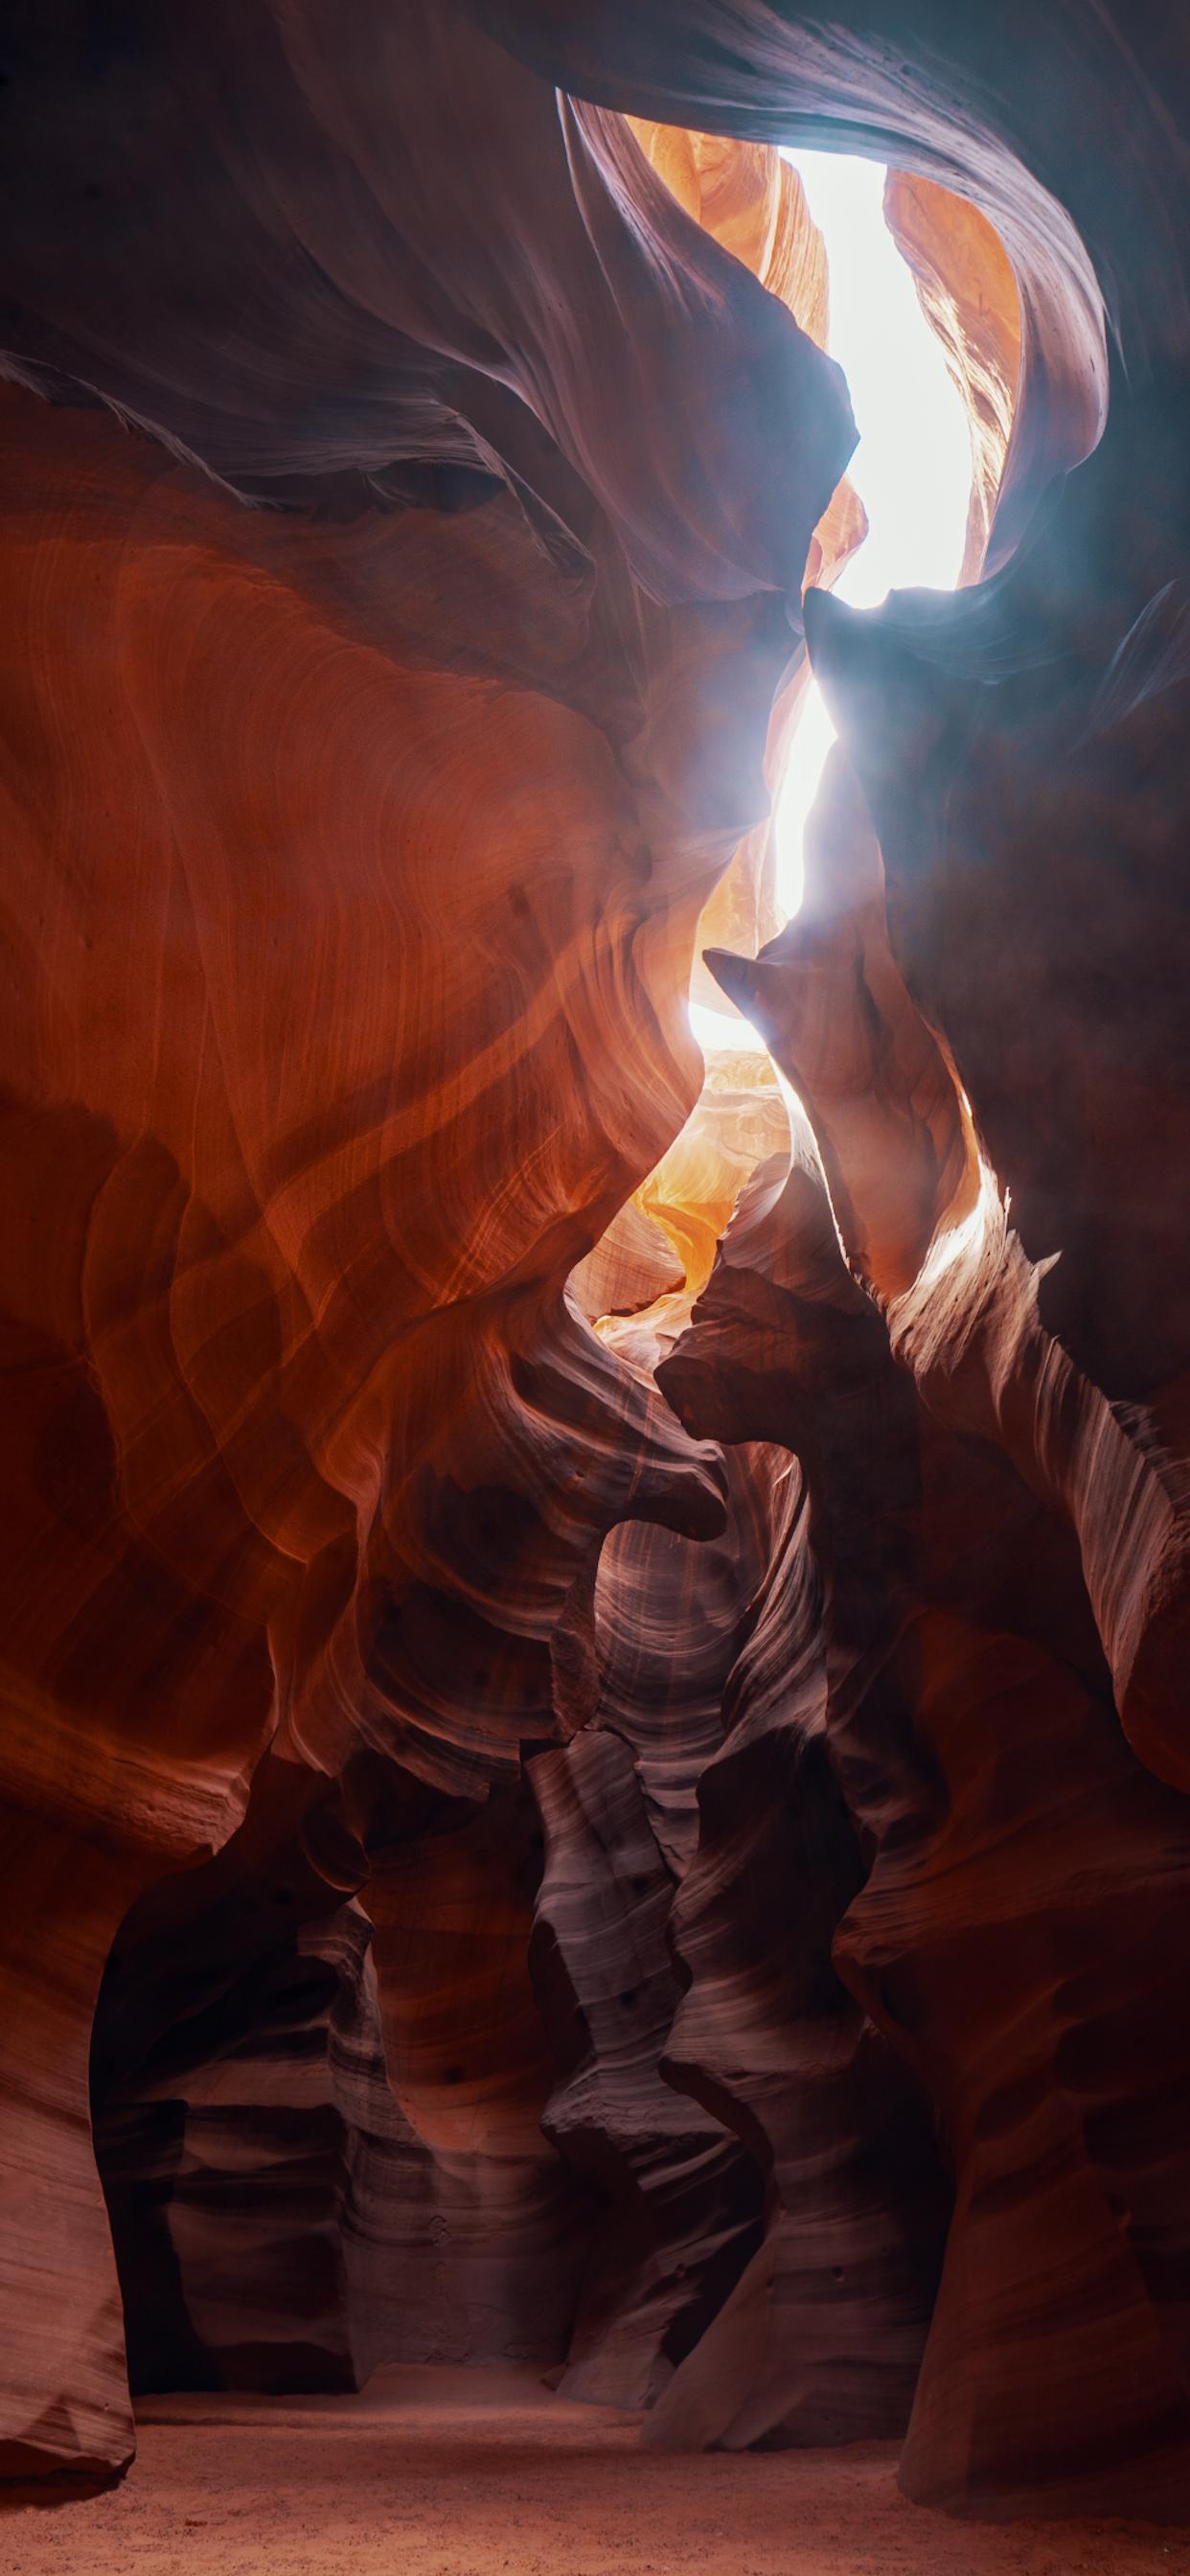 iPhone wallpapers cave antelope canyon 1 Fonds d'écran iPhone du 13/12/2019